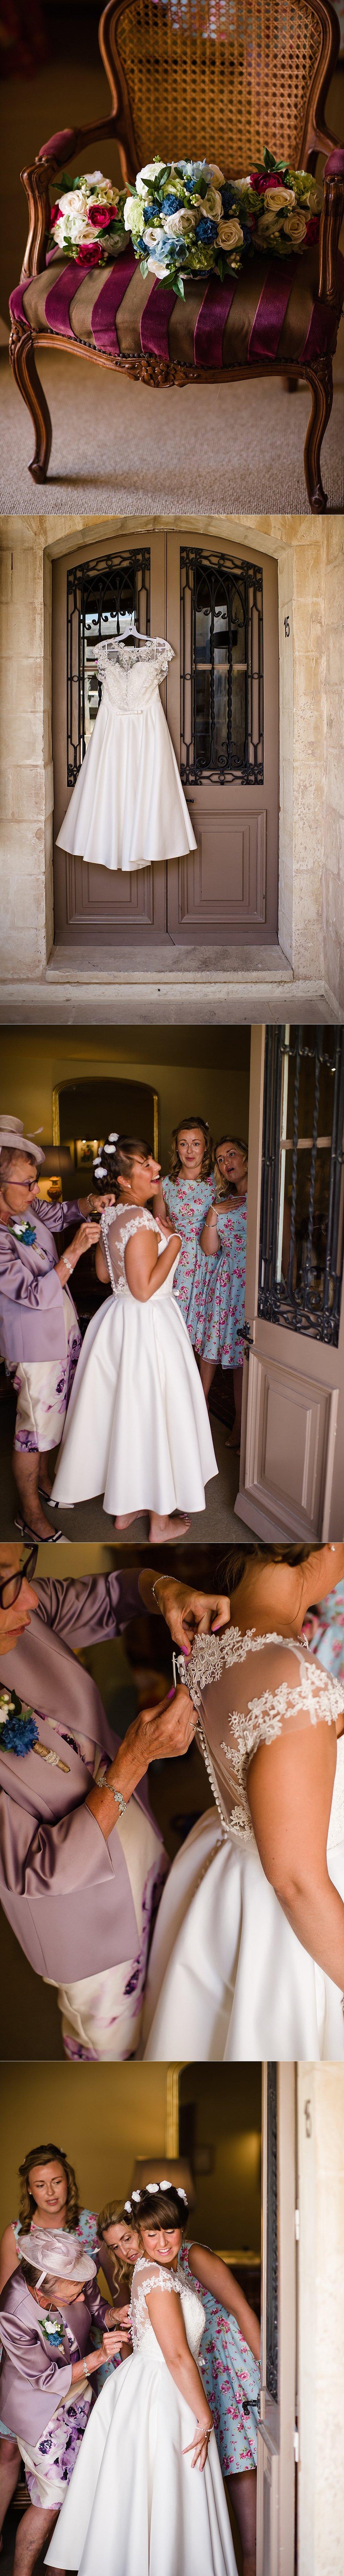 Laura & Mike - Xara Palace Mdina - Wedding Photography Malta - Shane P. Watts